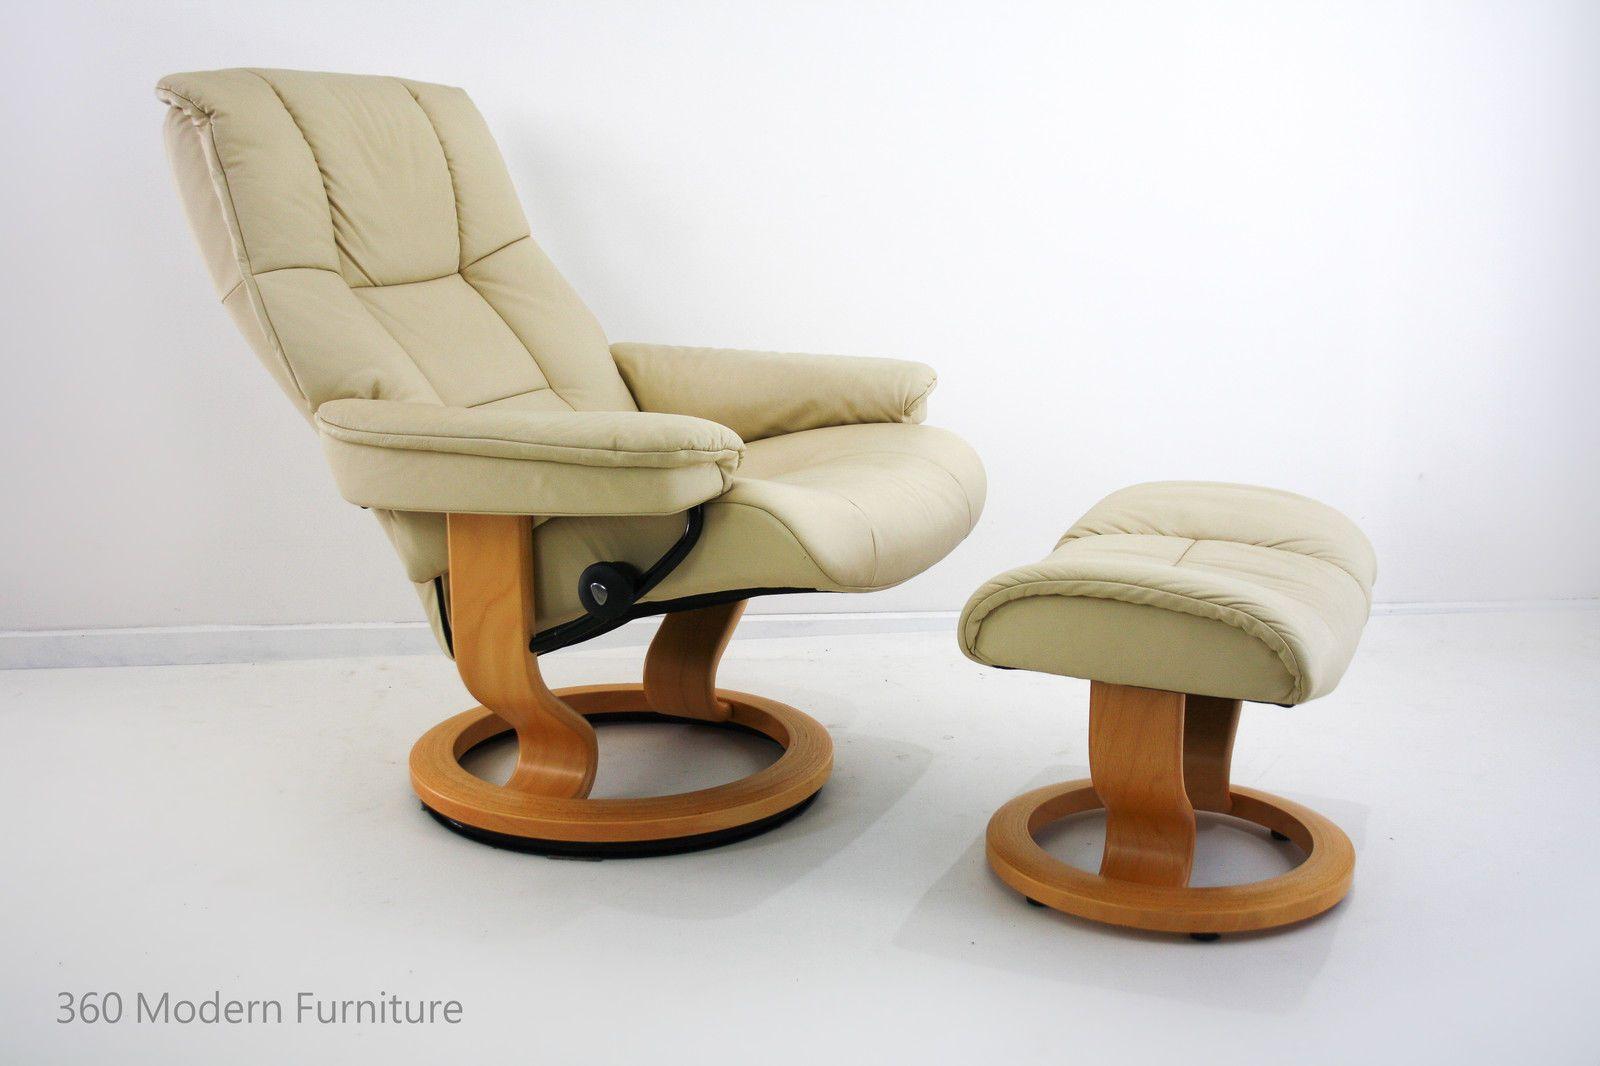 Stressless Ekornes Leather Armchair Recliner Swivel Chair